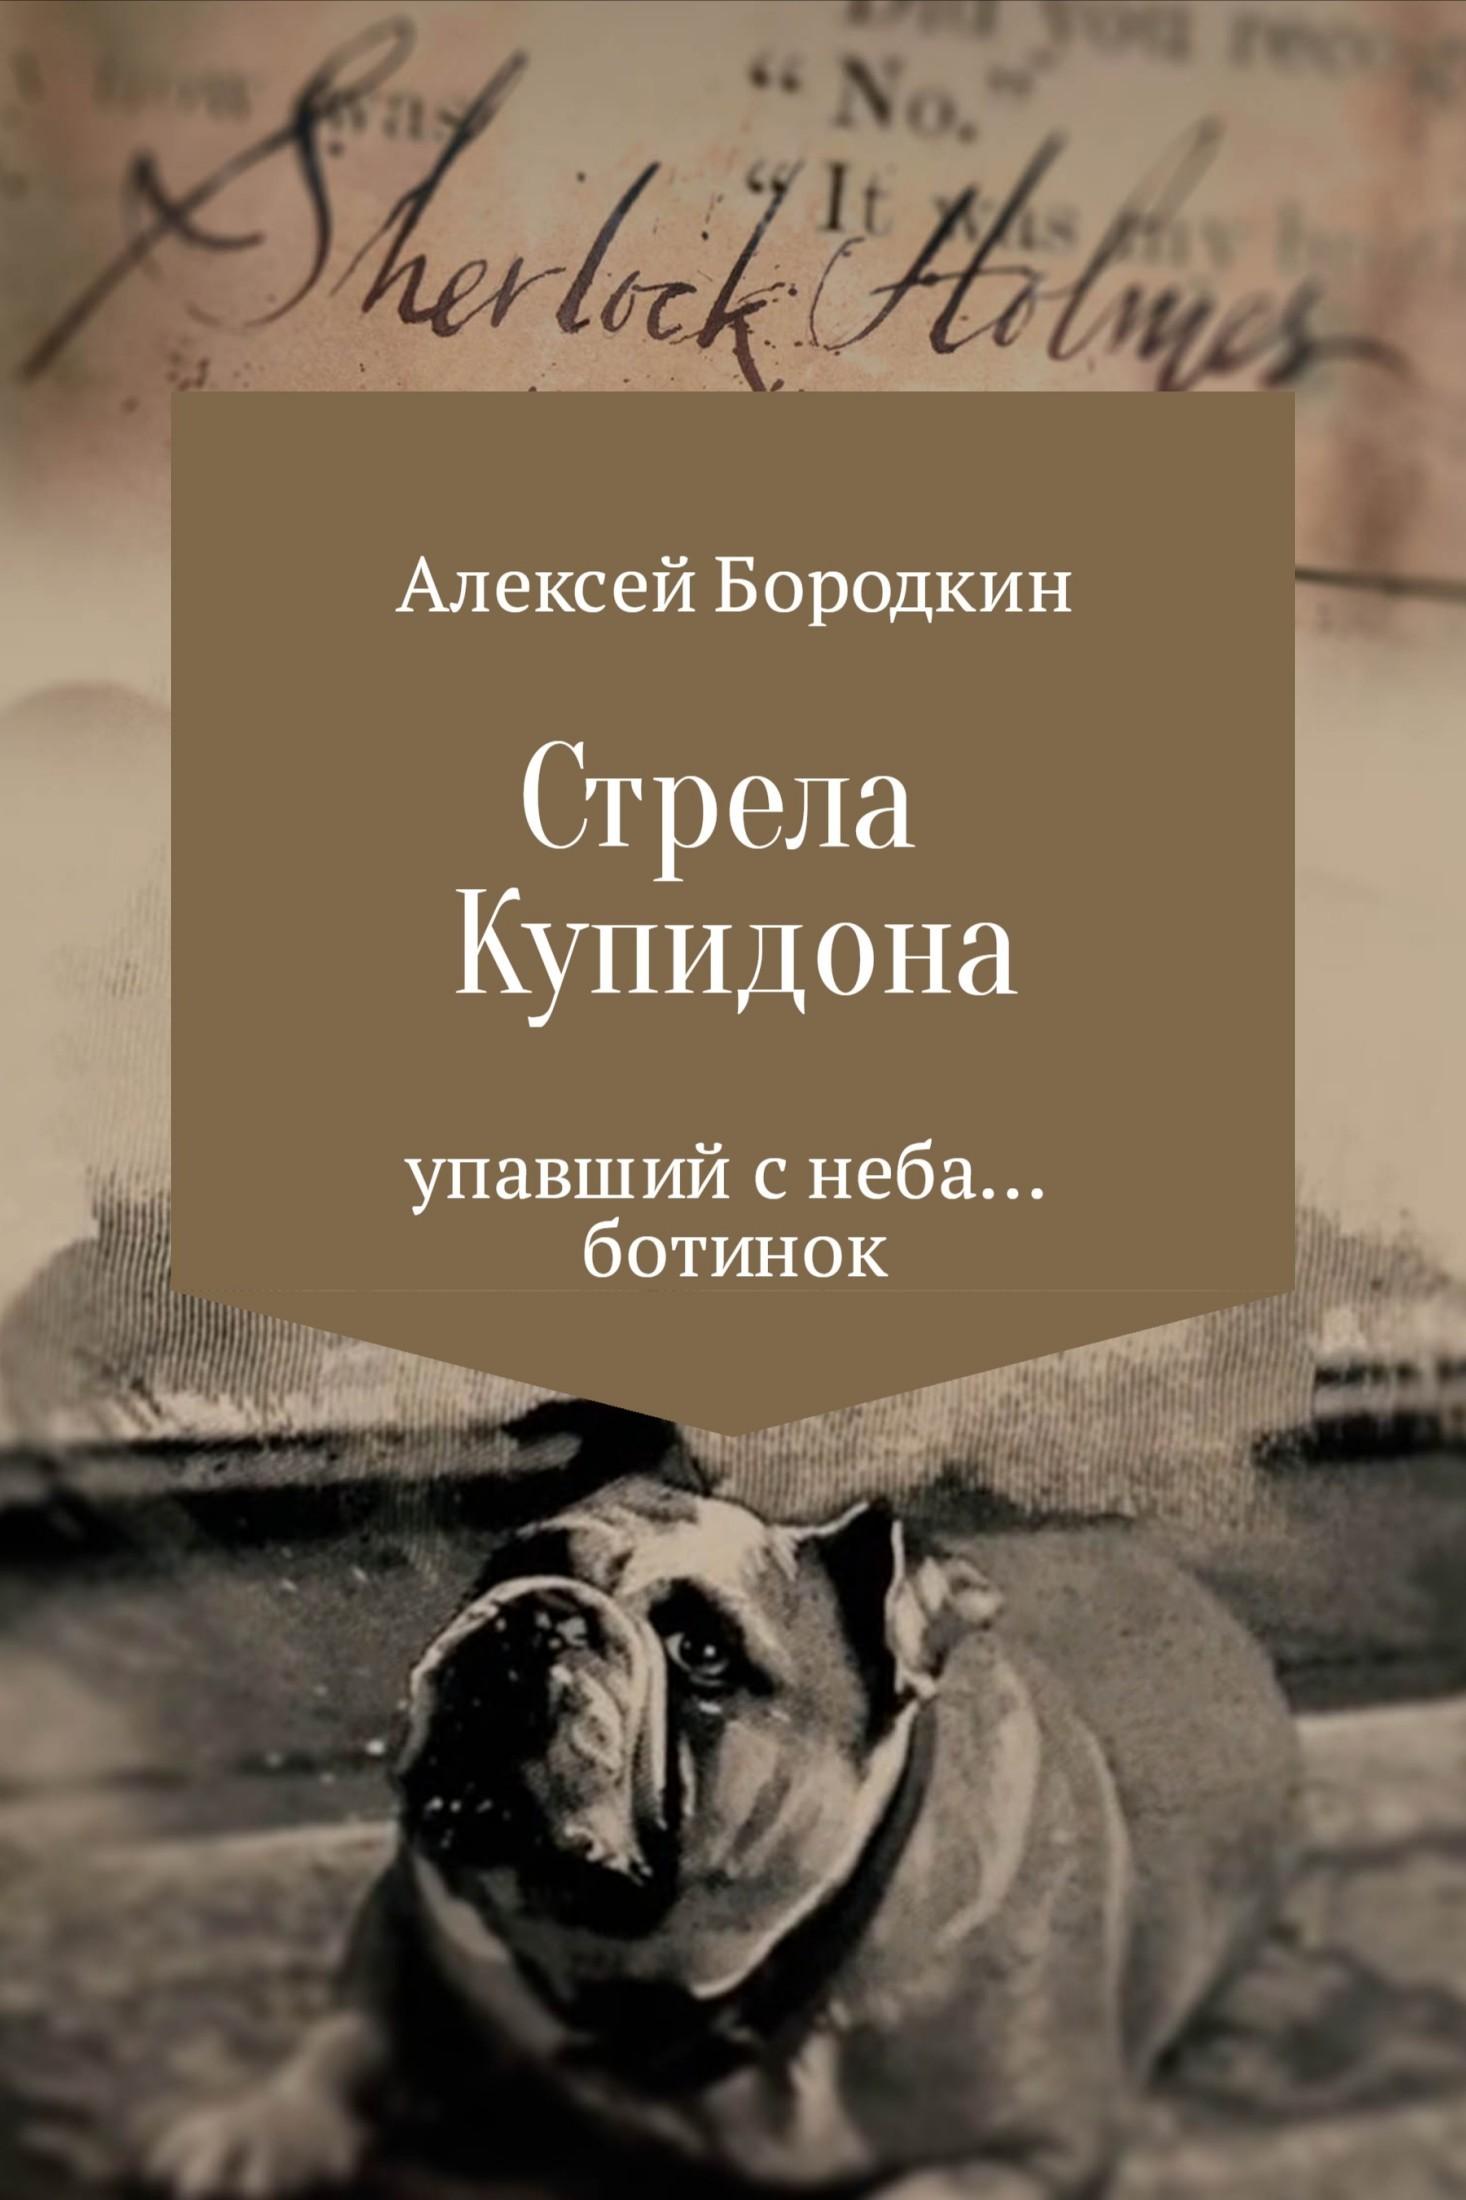 Алексей Петрович Бородкин Стрела Купидона алексей петрович бородкин святой антоний